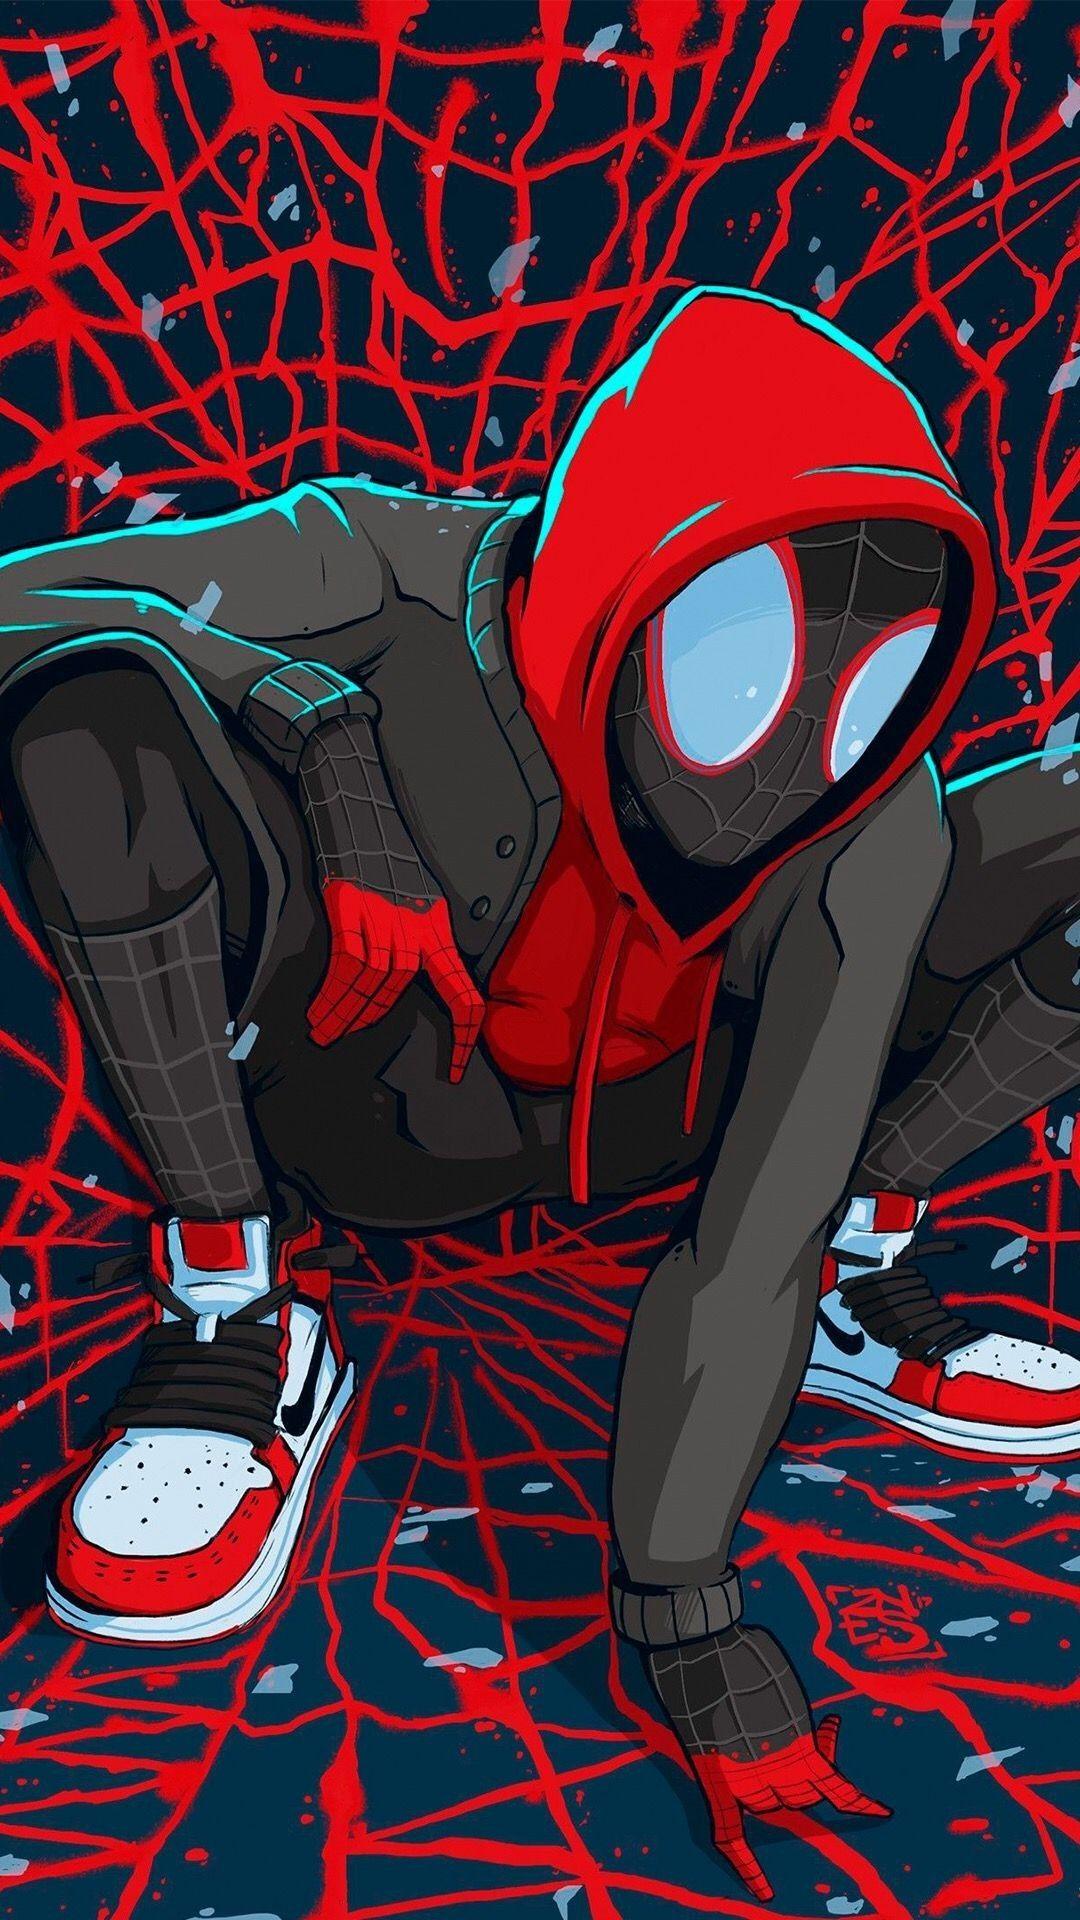 Pin By Nakia Campbell On Marvel At The Superhuman Spiderman Art Spiderman Artwork Superhero Wallpaper